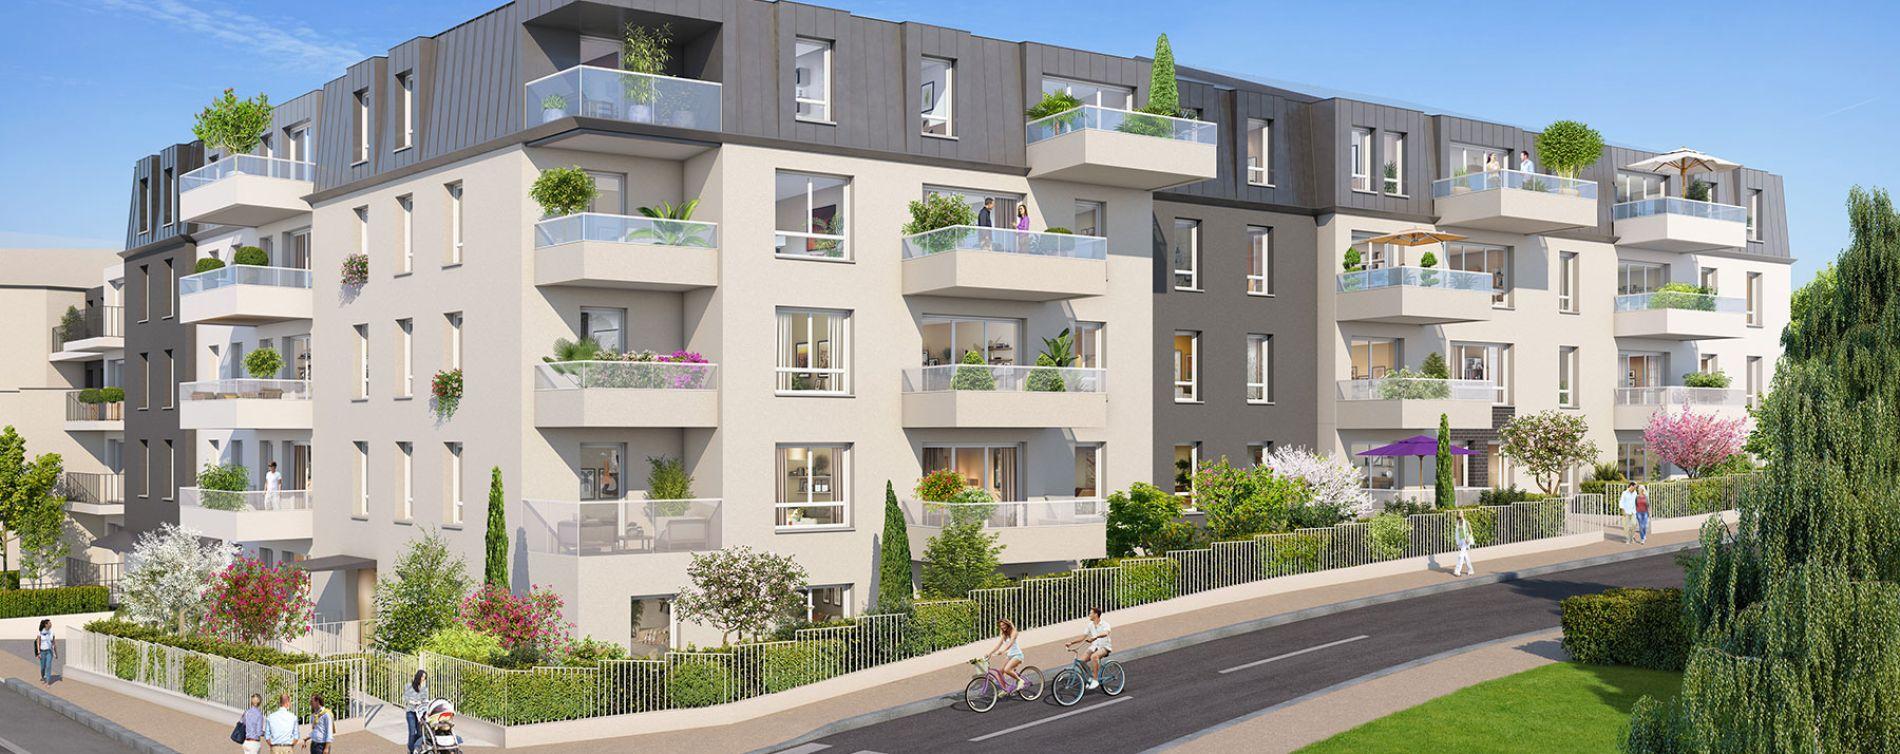 Résidence Reflets Mansart à Dijon